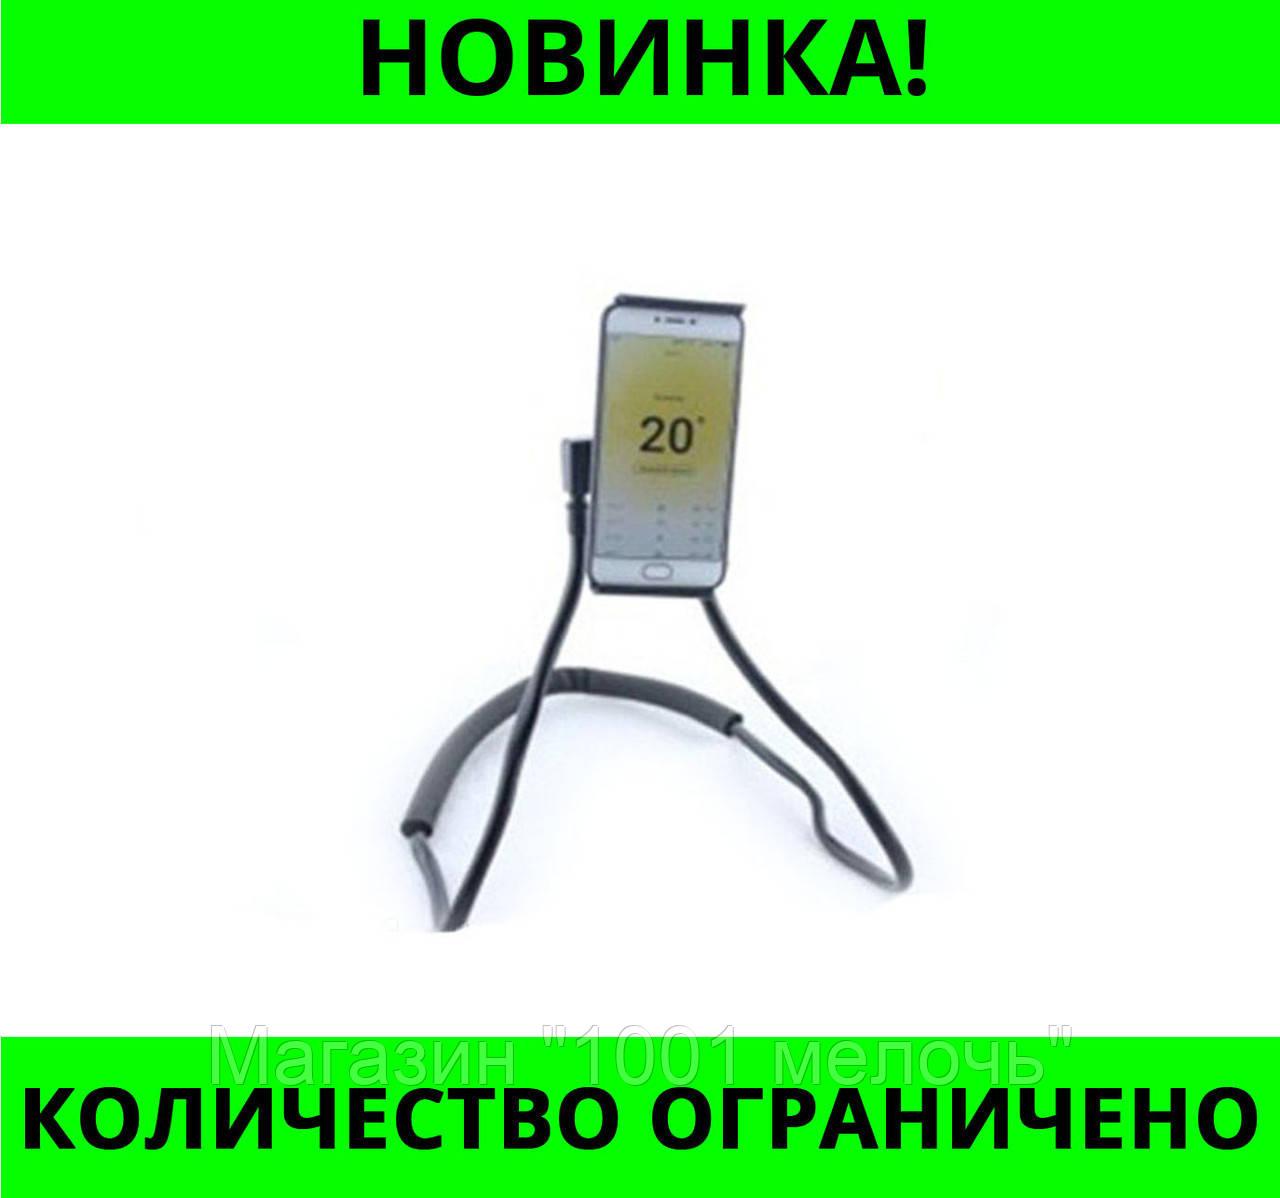 SALE! Держатель для смартфона HOLDER WAIST LR 002